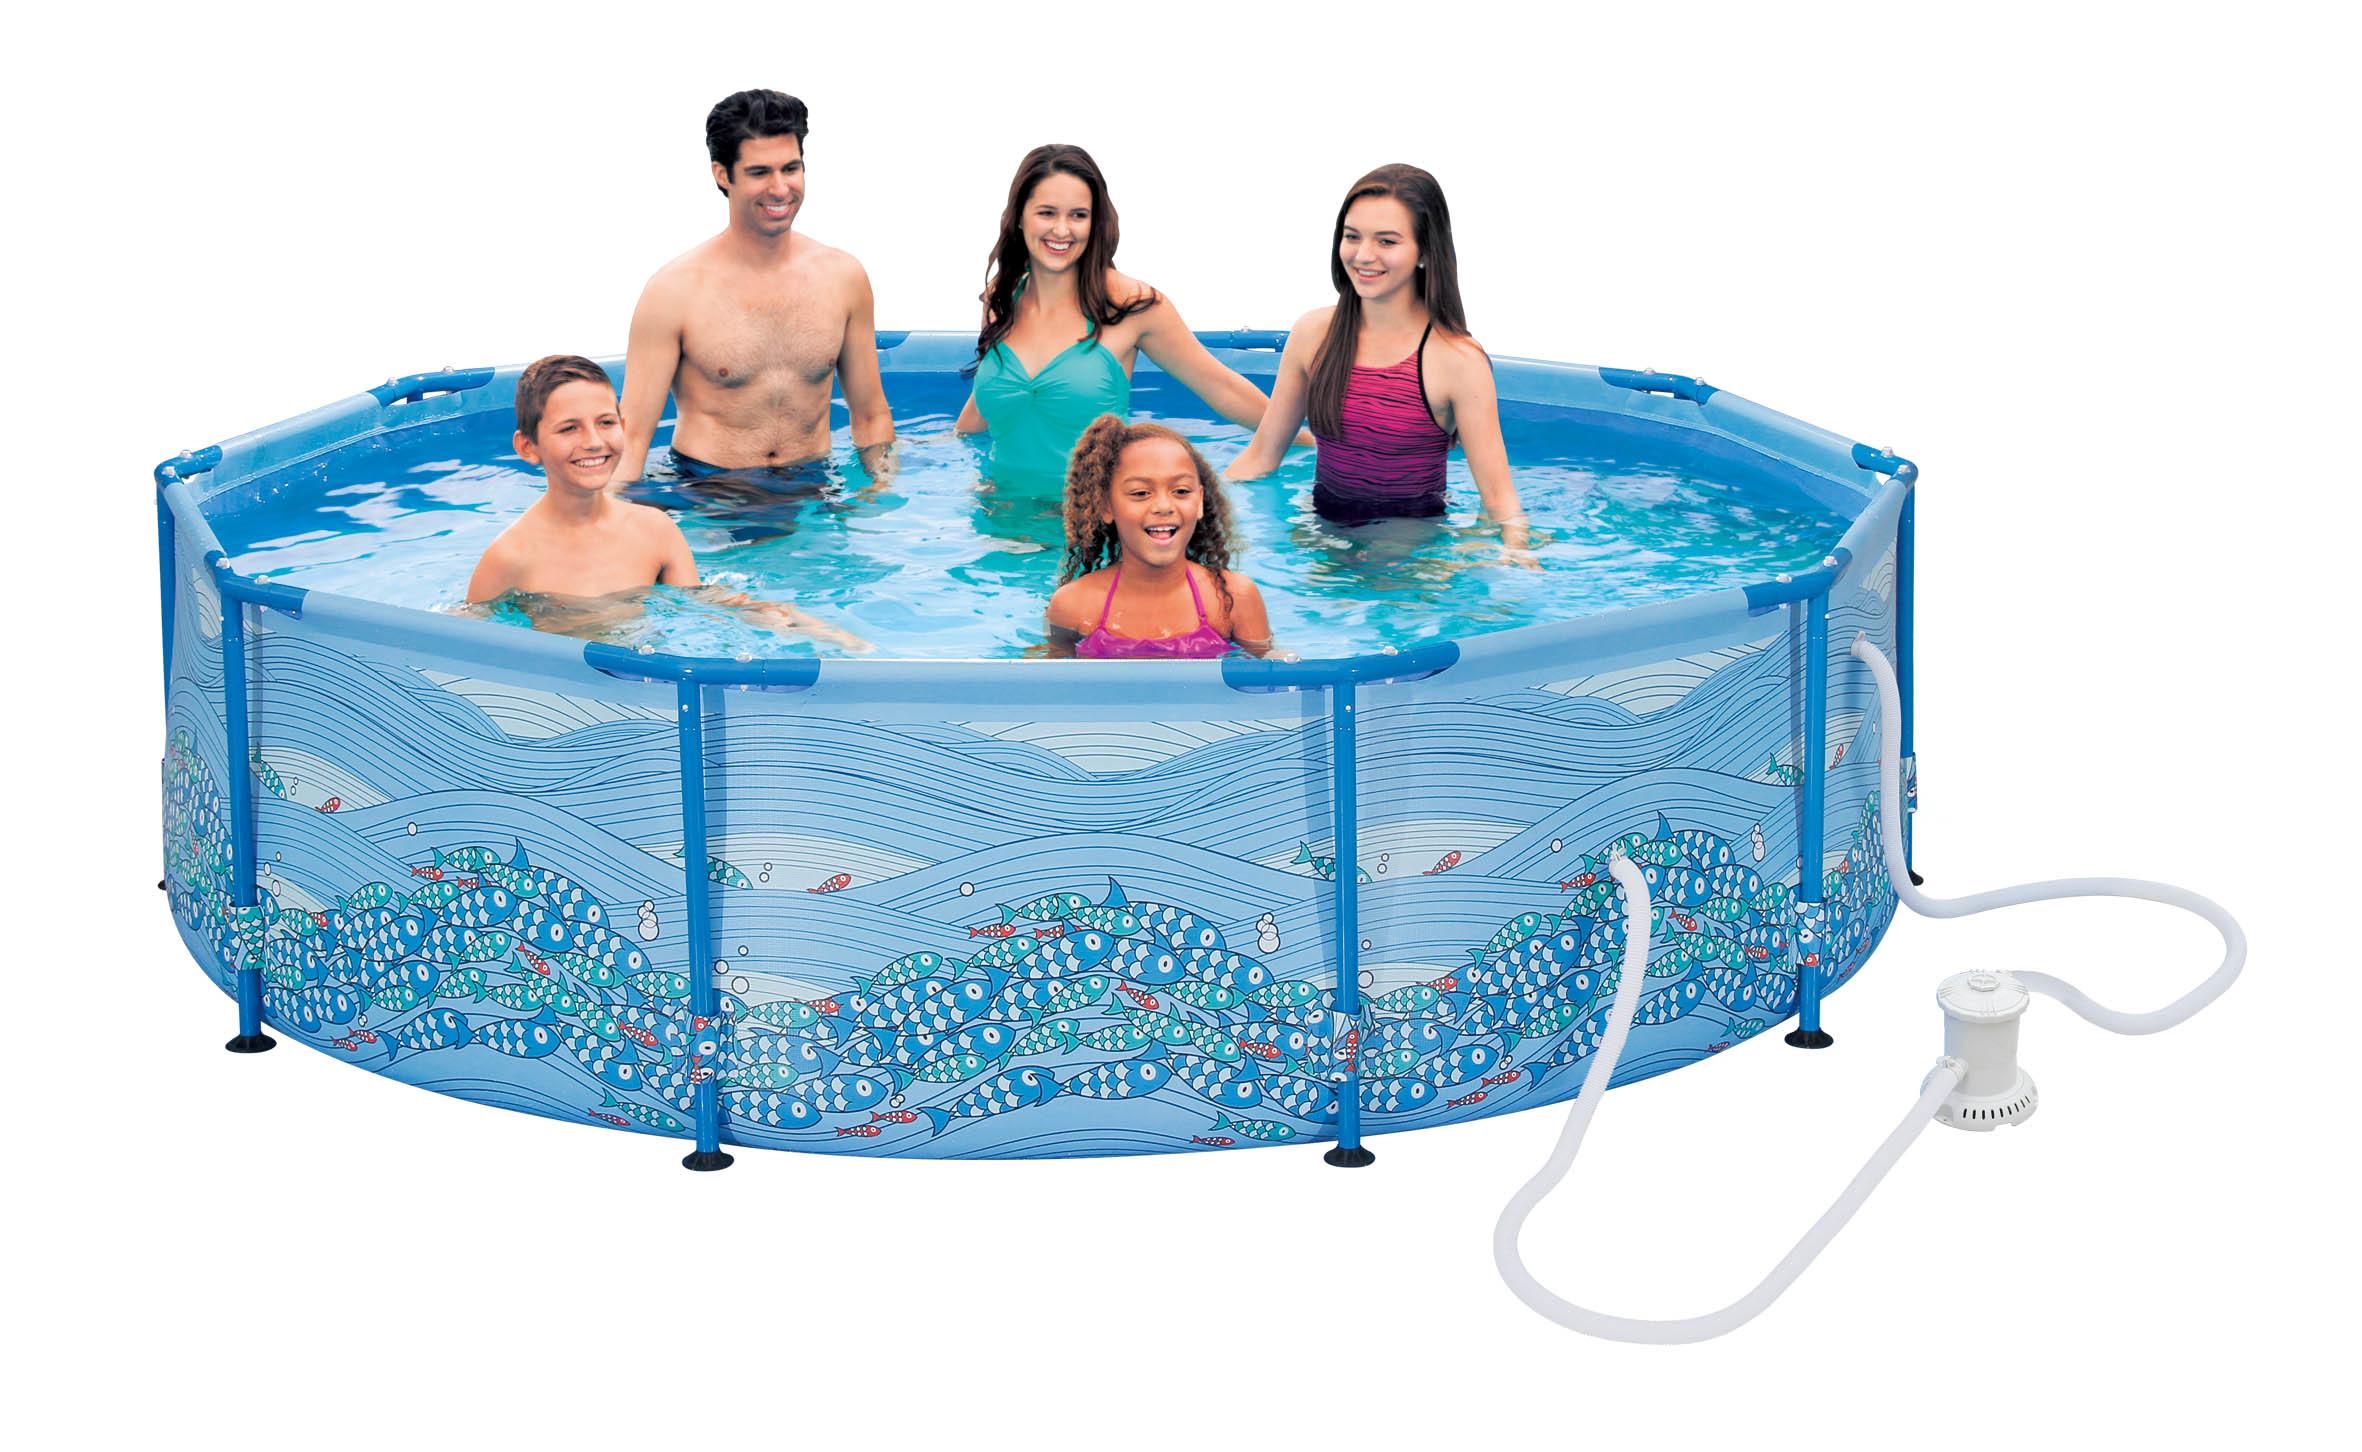 kit piscine pas cher gre pools kit piscine hors sol acier ronde pacific aspect bois with kit. Black Bedroom Furniture Sets. Home Design Ideas